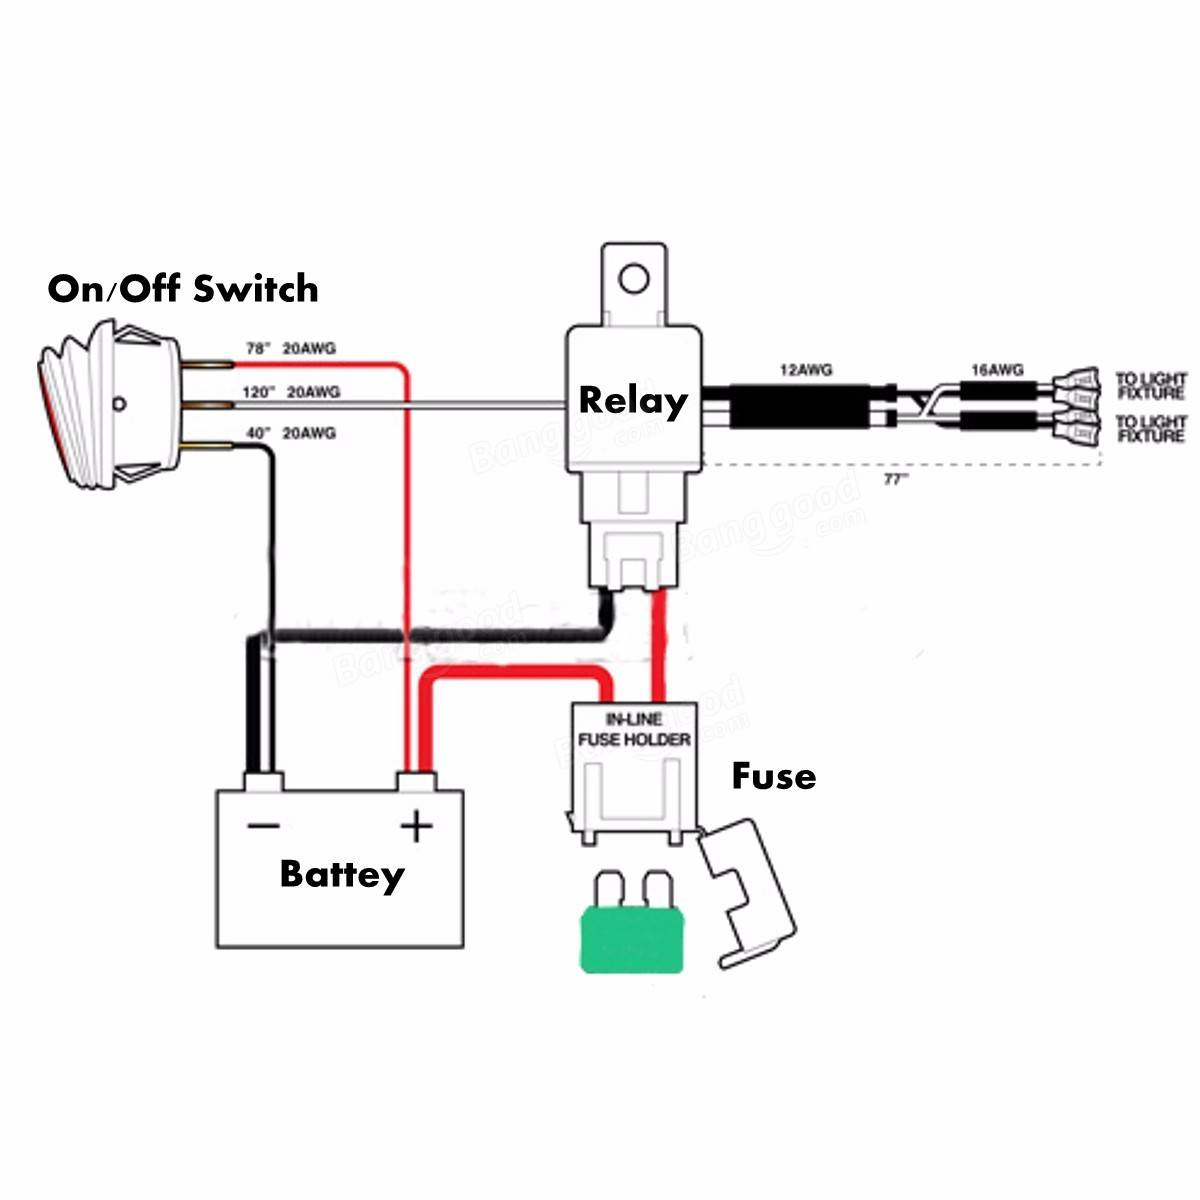 hight resolution of whirlpool dryer wiring diagram 22000ayw wiring library diagram h9whirlpool dryer wiring diagram 22000ayw wiring library laundry